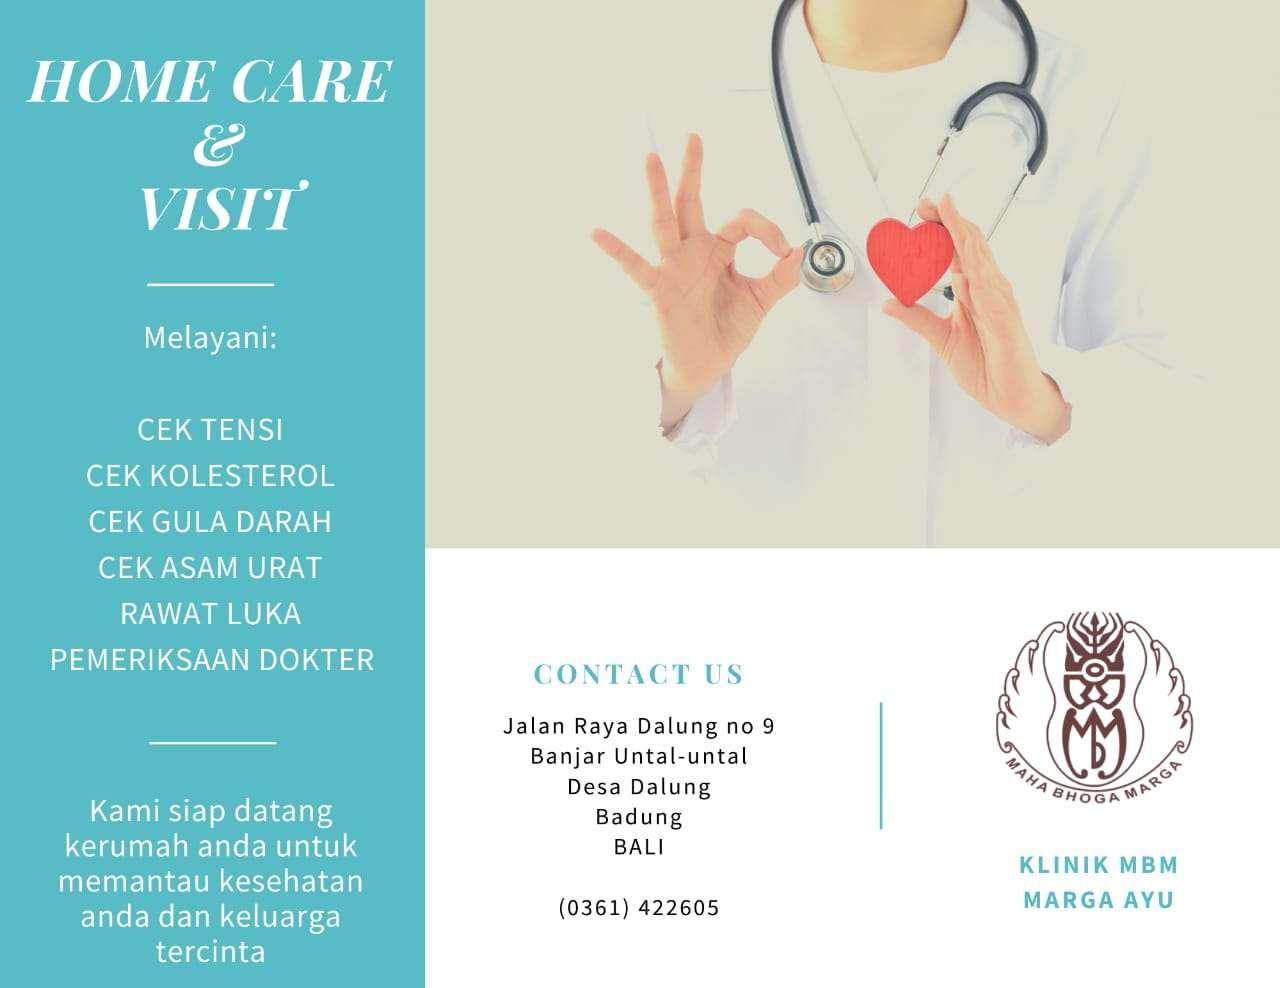 Klinik MBM Marga Ayu melayani Home Care & Visit